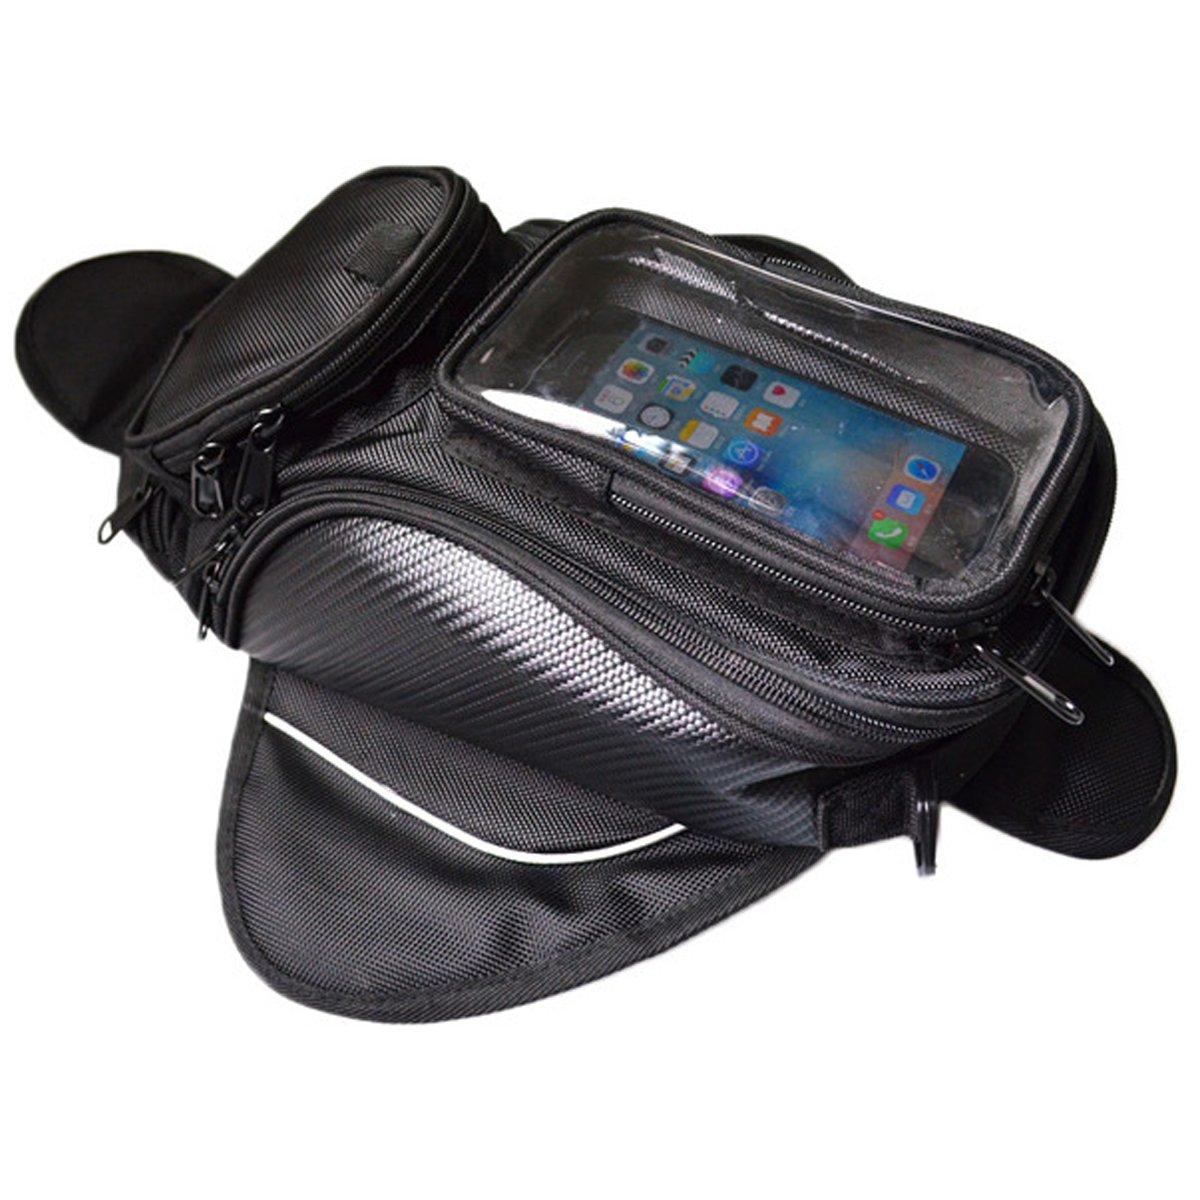 Lozom Motorcycle Gas Oil Fuel Tank Bag Waterproof Backpack & Magnetic Motorcycle Tank Bag for Honda Yamaha Suzuki Kawasaki Harley by Lozom